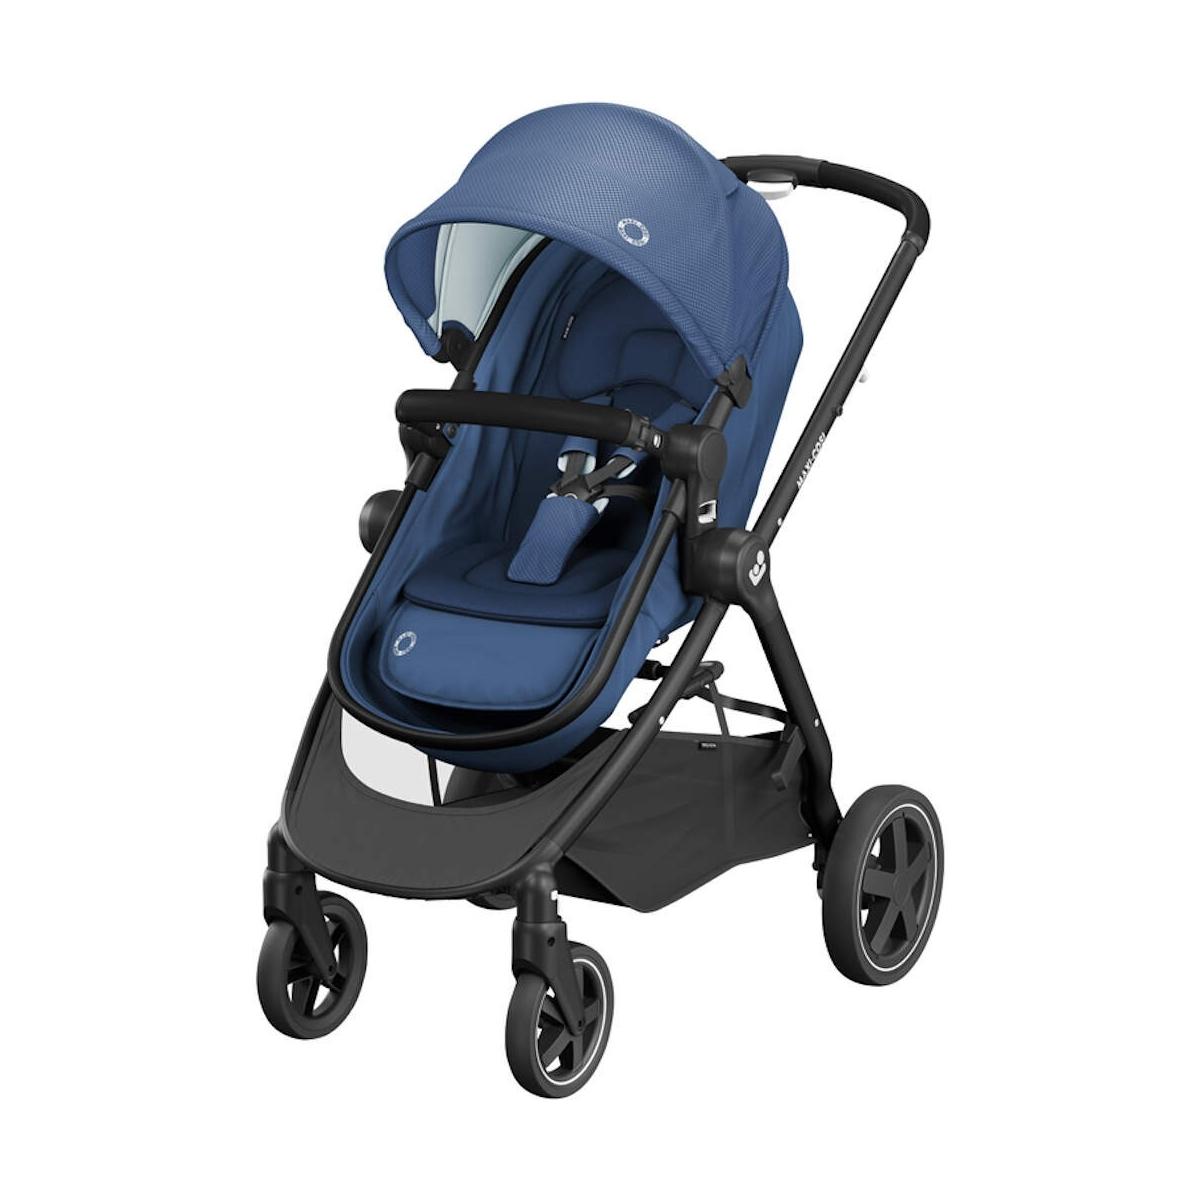 Maxi Cosi Zelia2 Pushchair-Essential Blue (NEW)